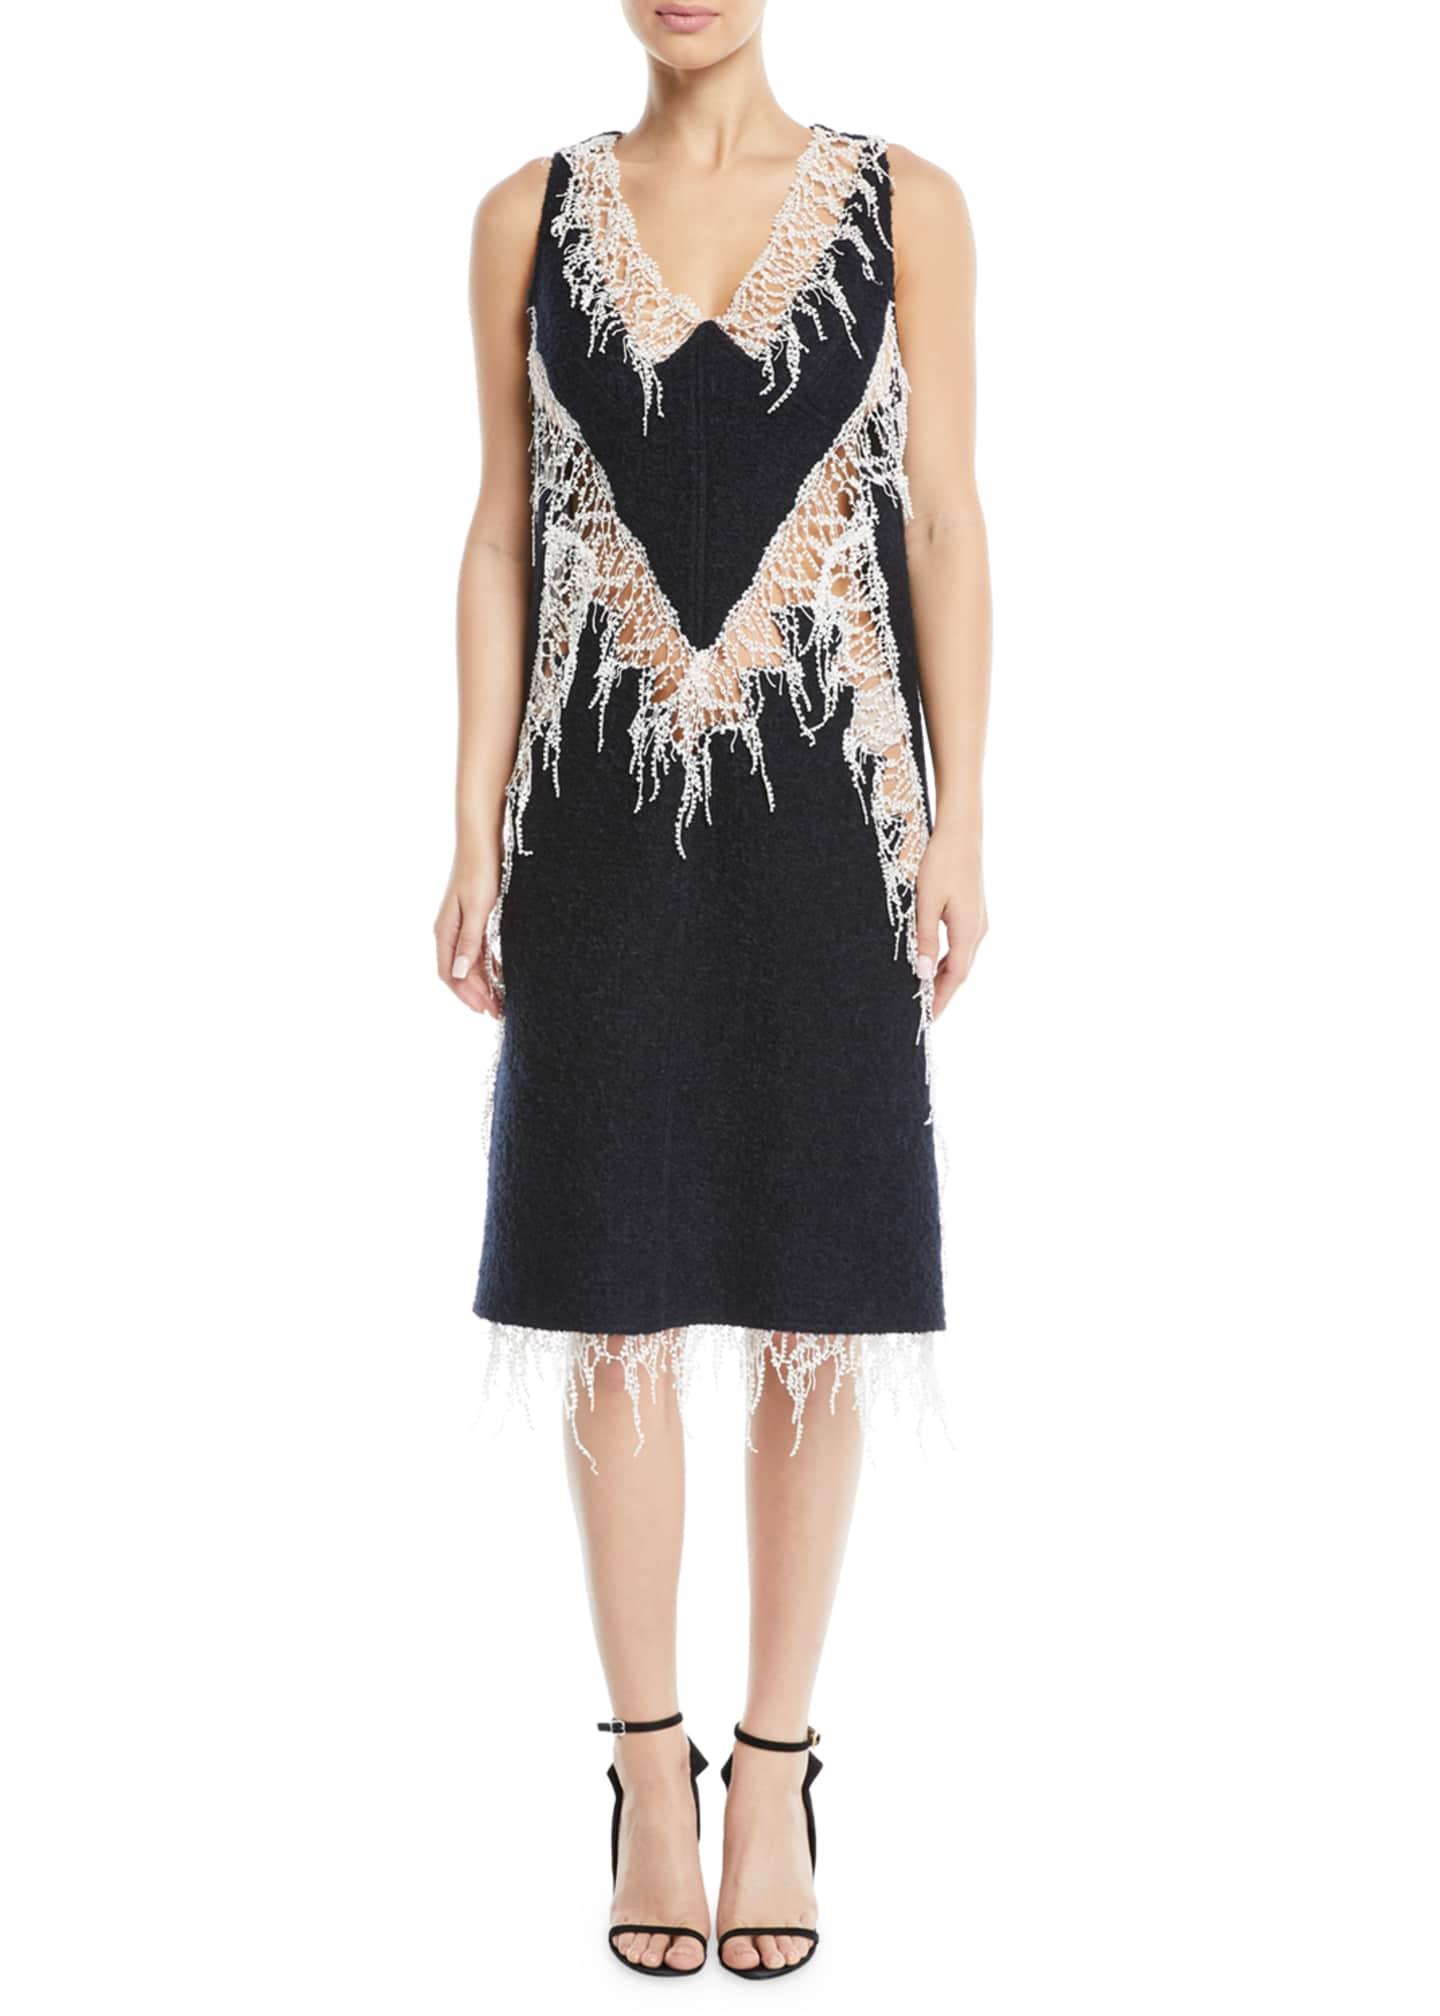 CALVIN KLEIN 205W39NYC V-Neck Sleeveless Wool Boucle Dress